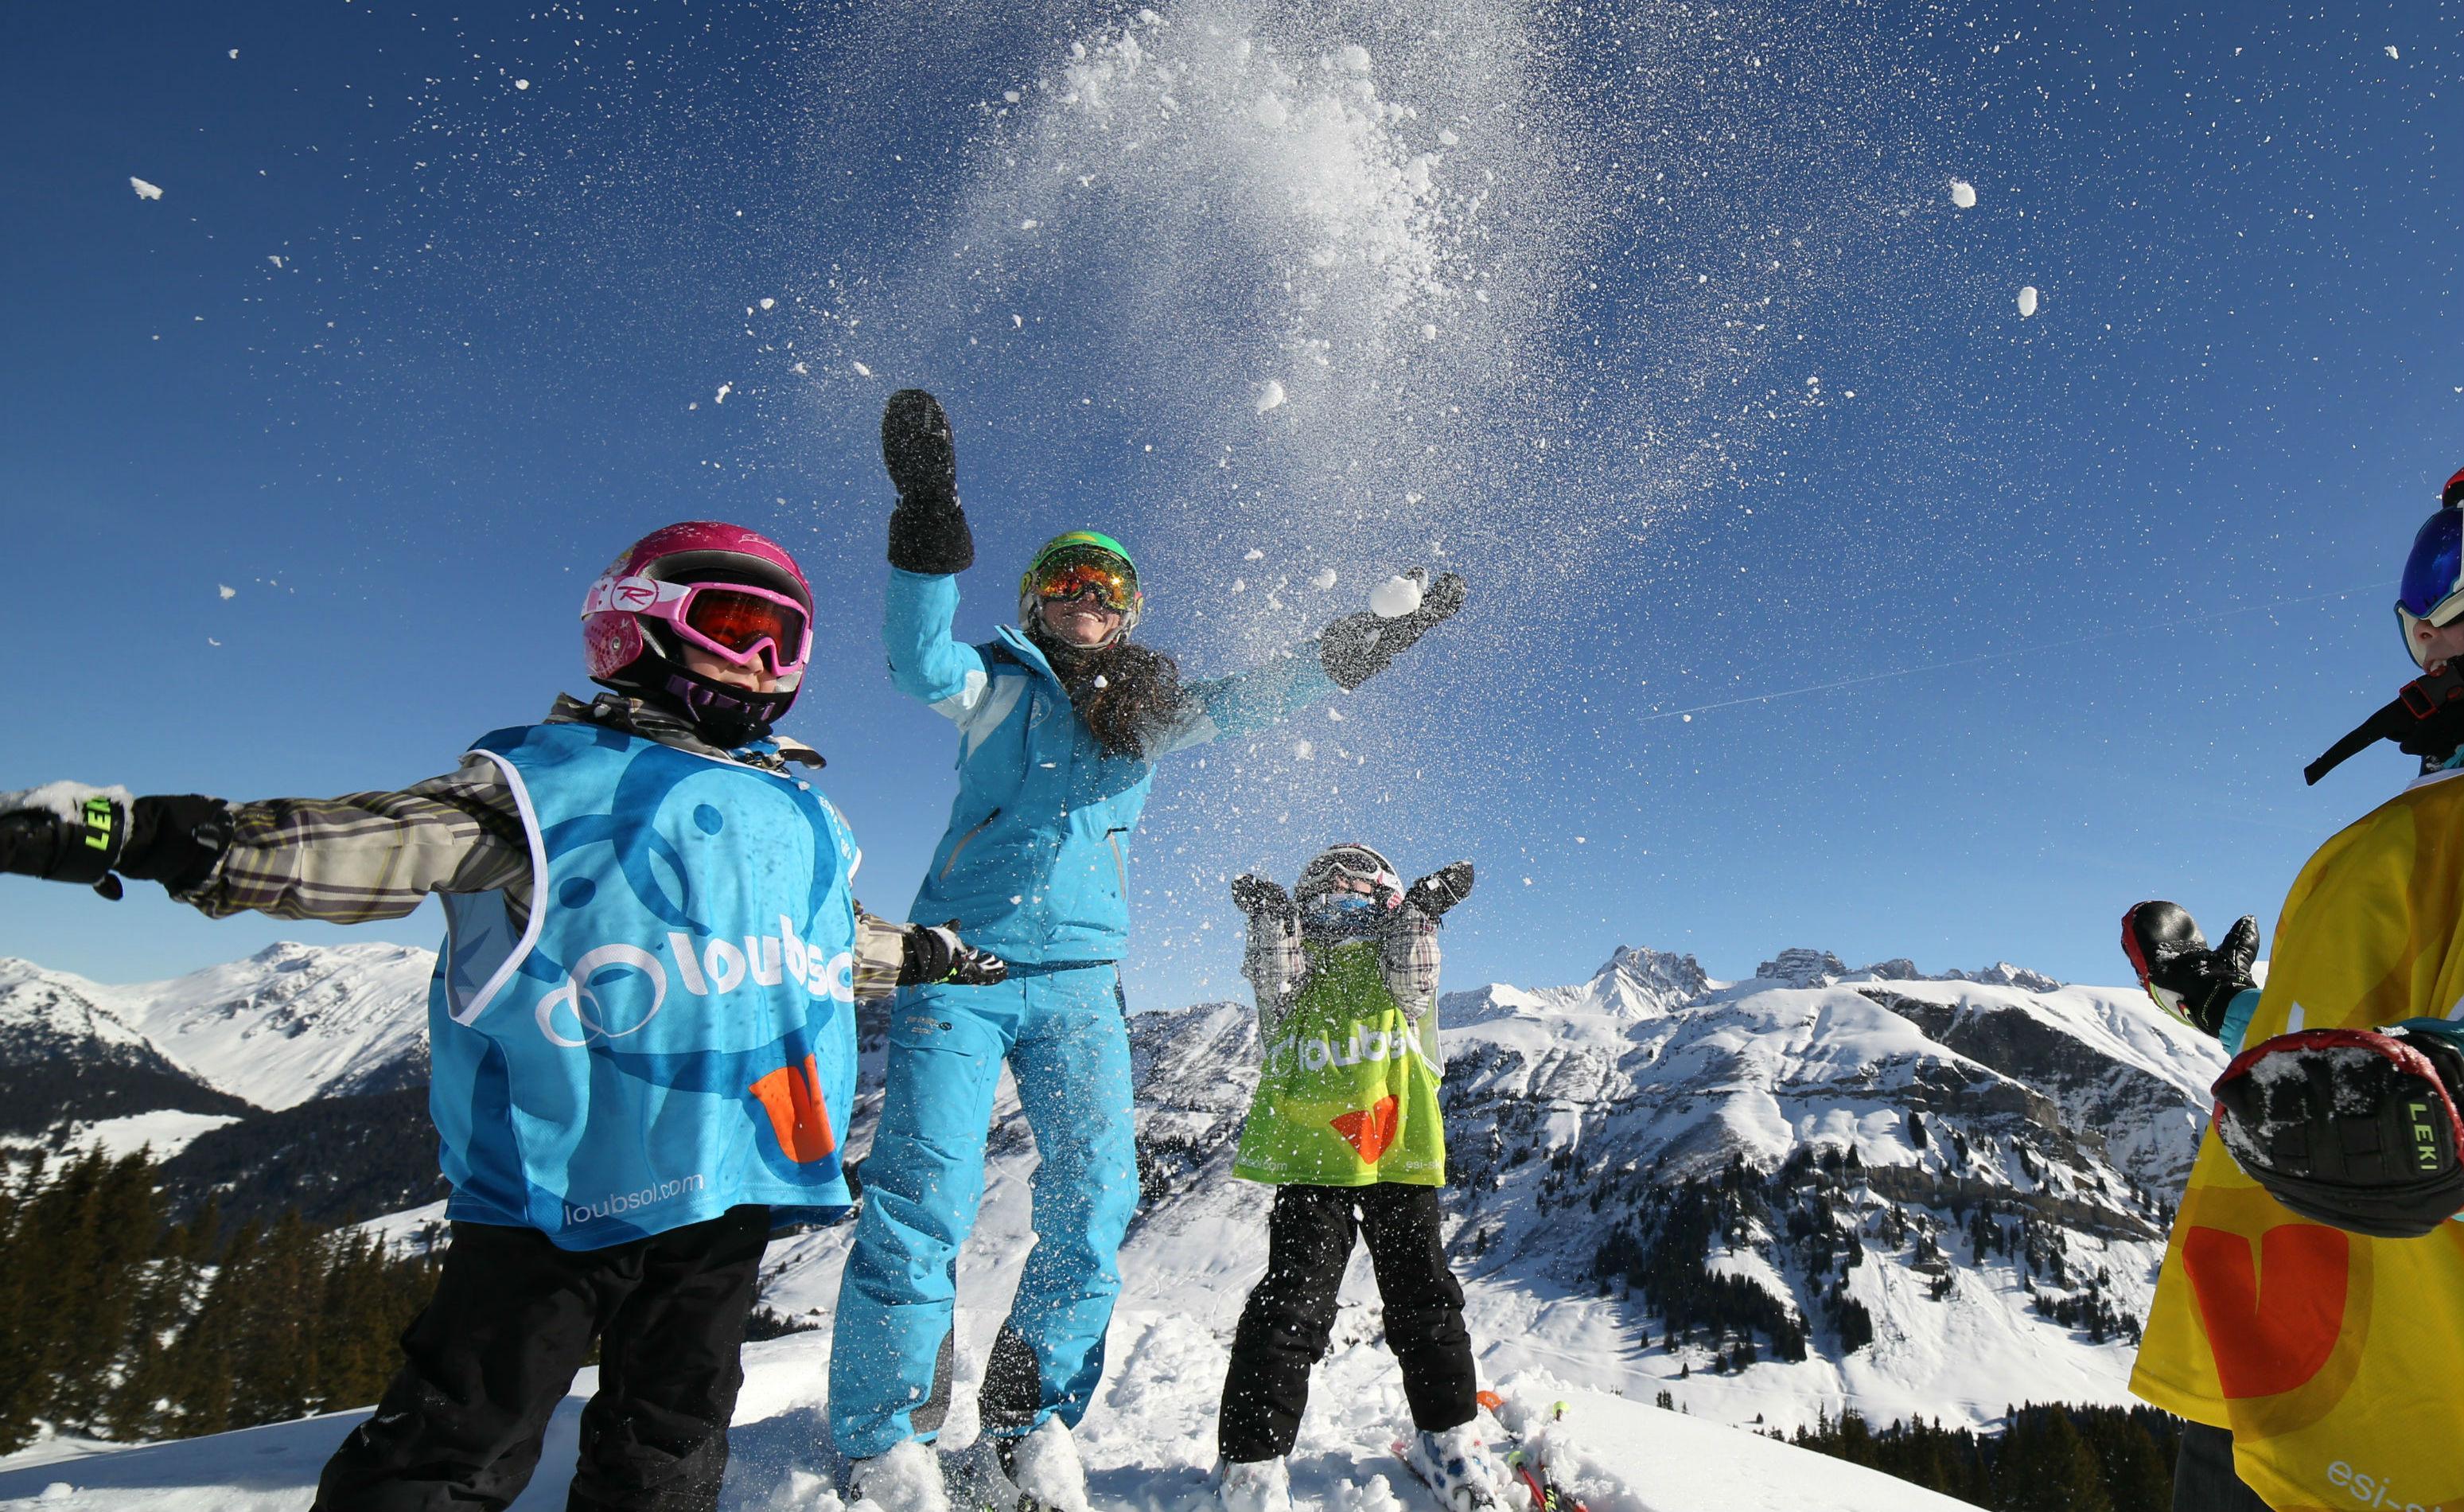 Ski Lessons for Kids (6-13 years) - High Season - Advanced